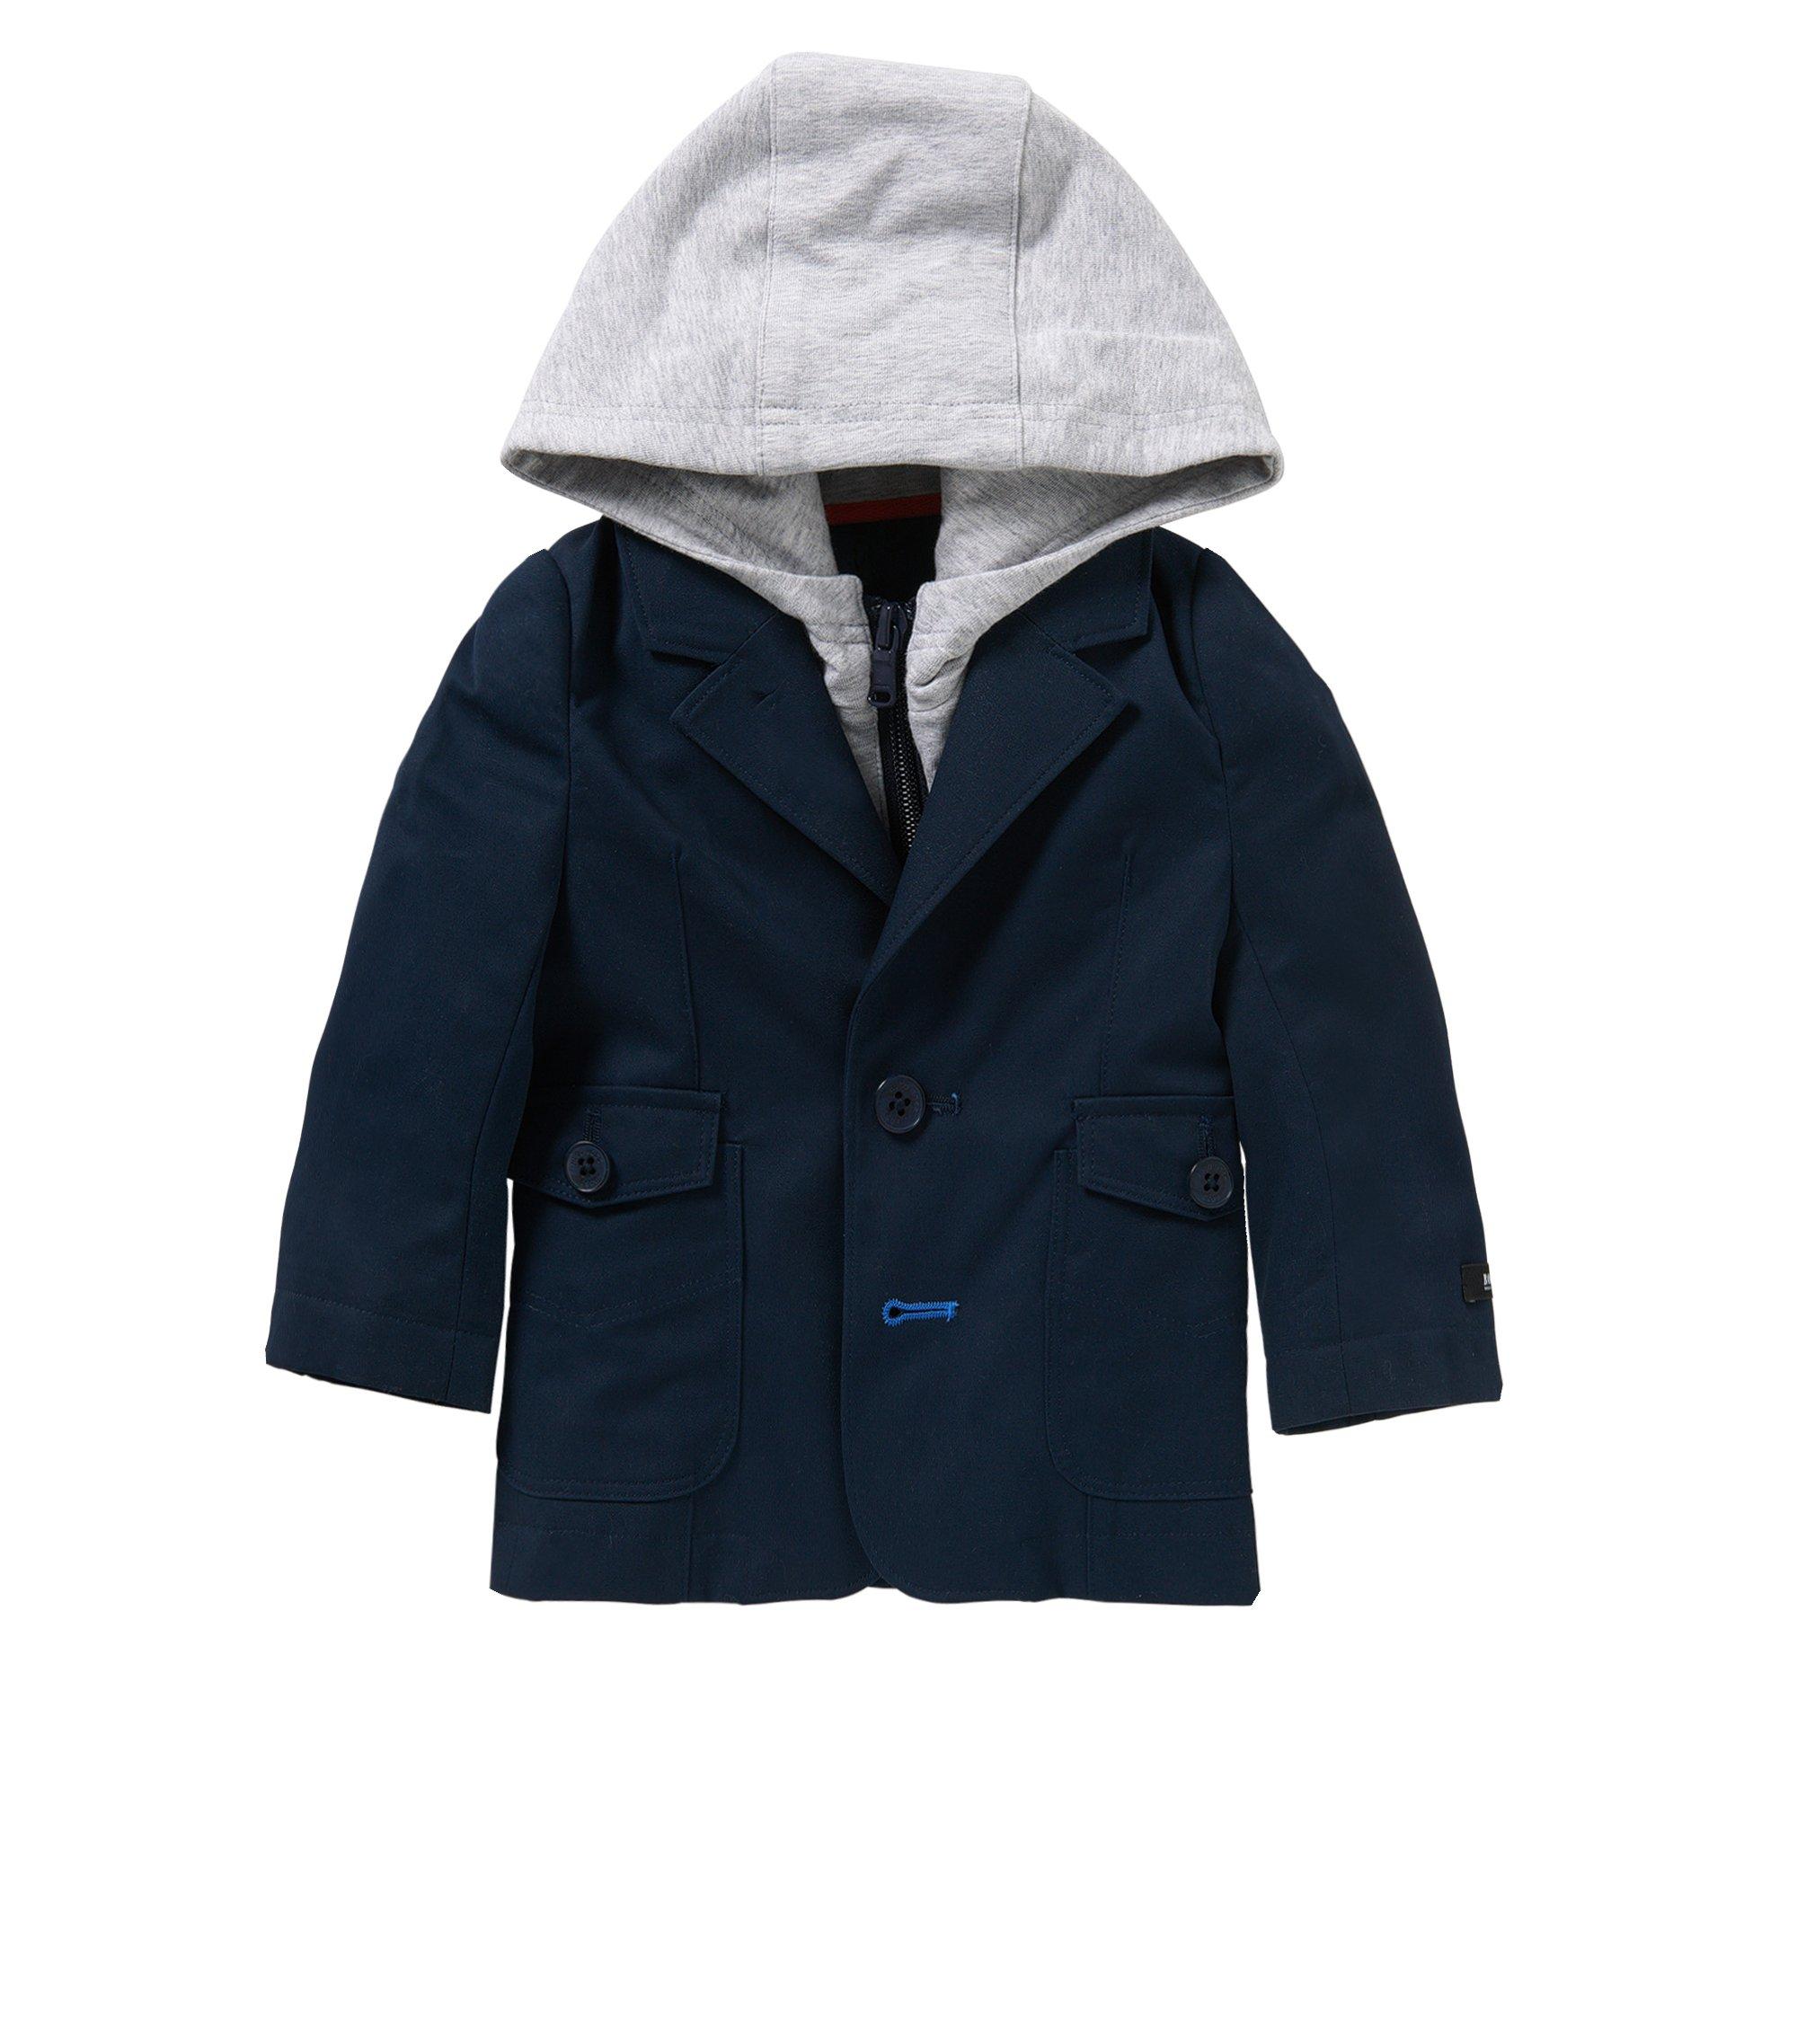 'J06138'   Newborn Cotton Sport Coat, Detachable Hood, Dark Blue